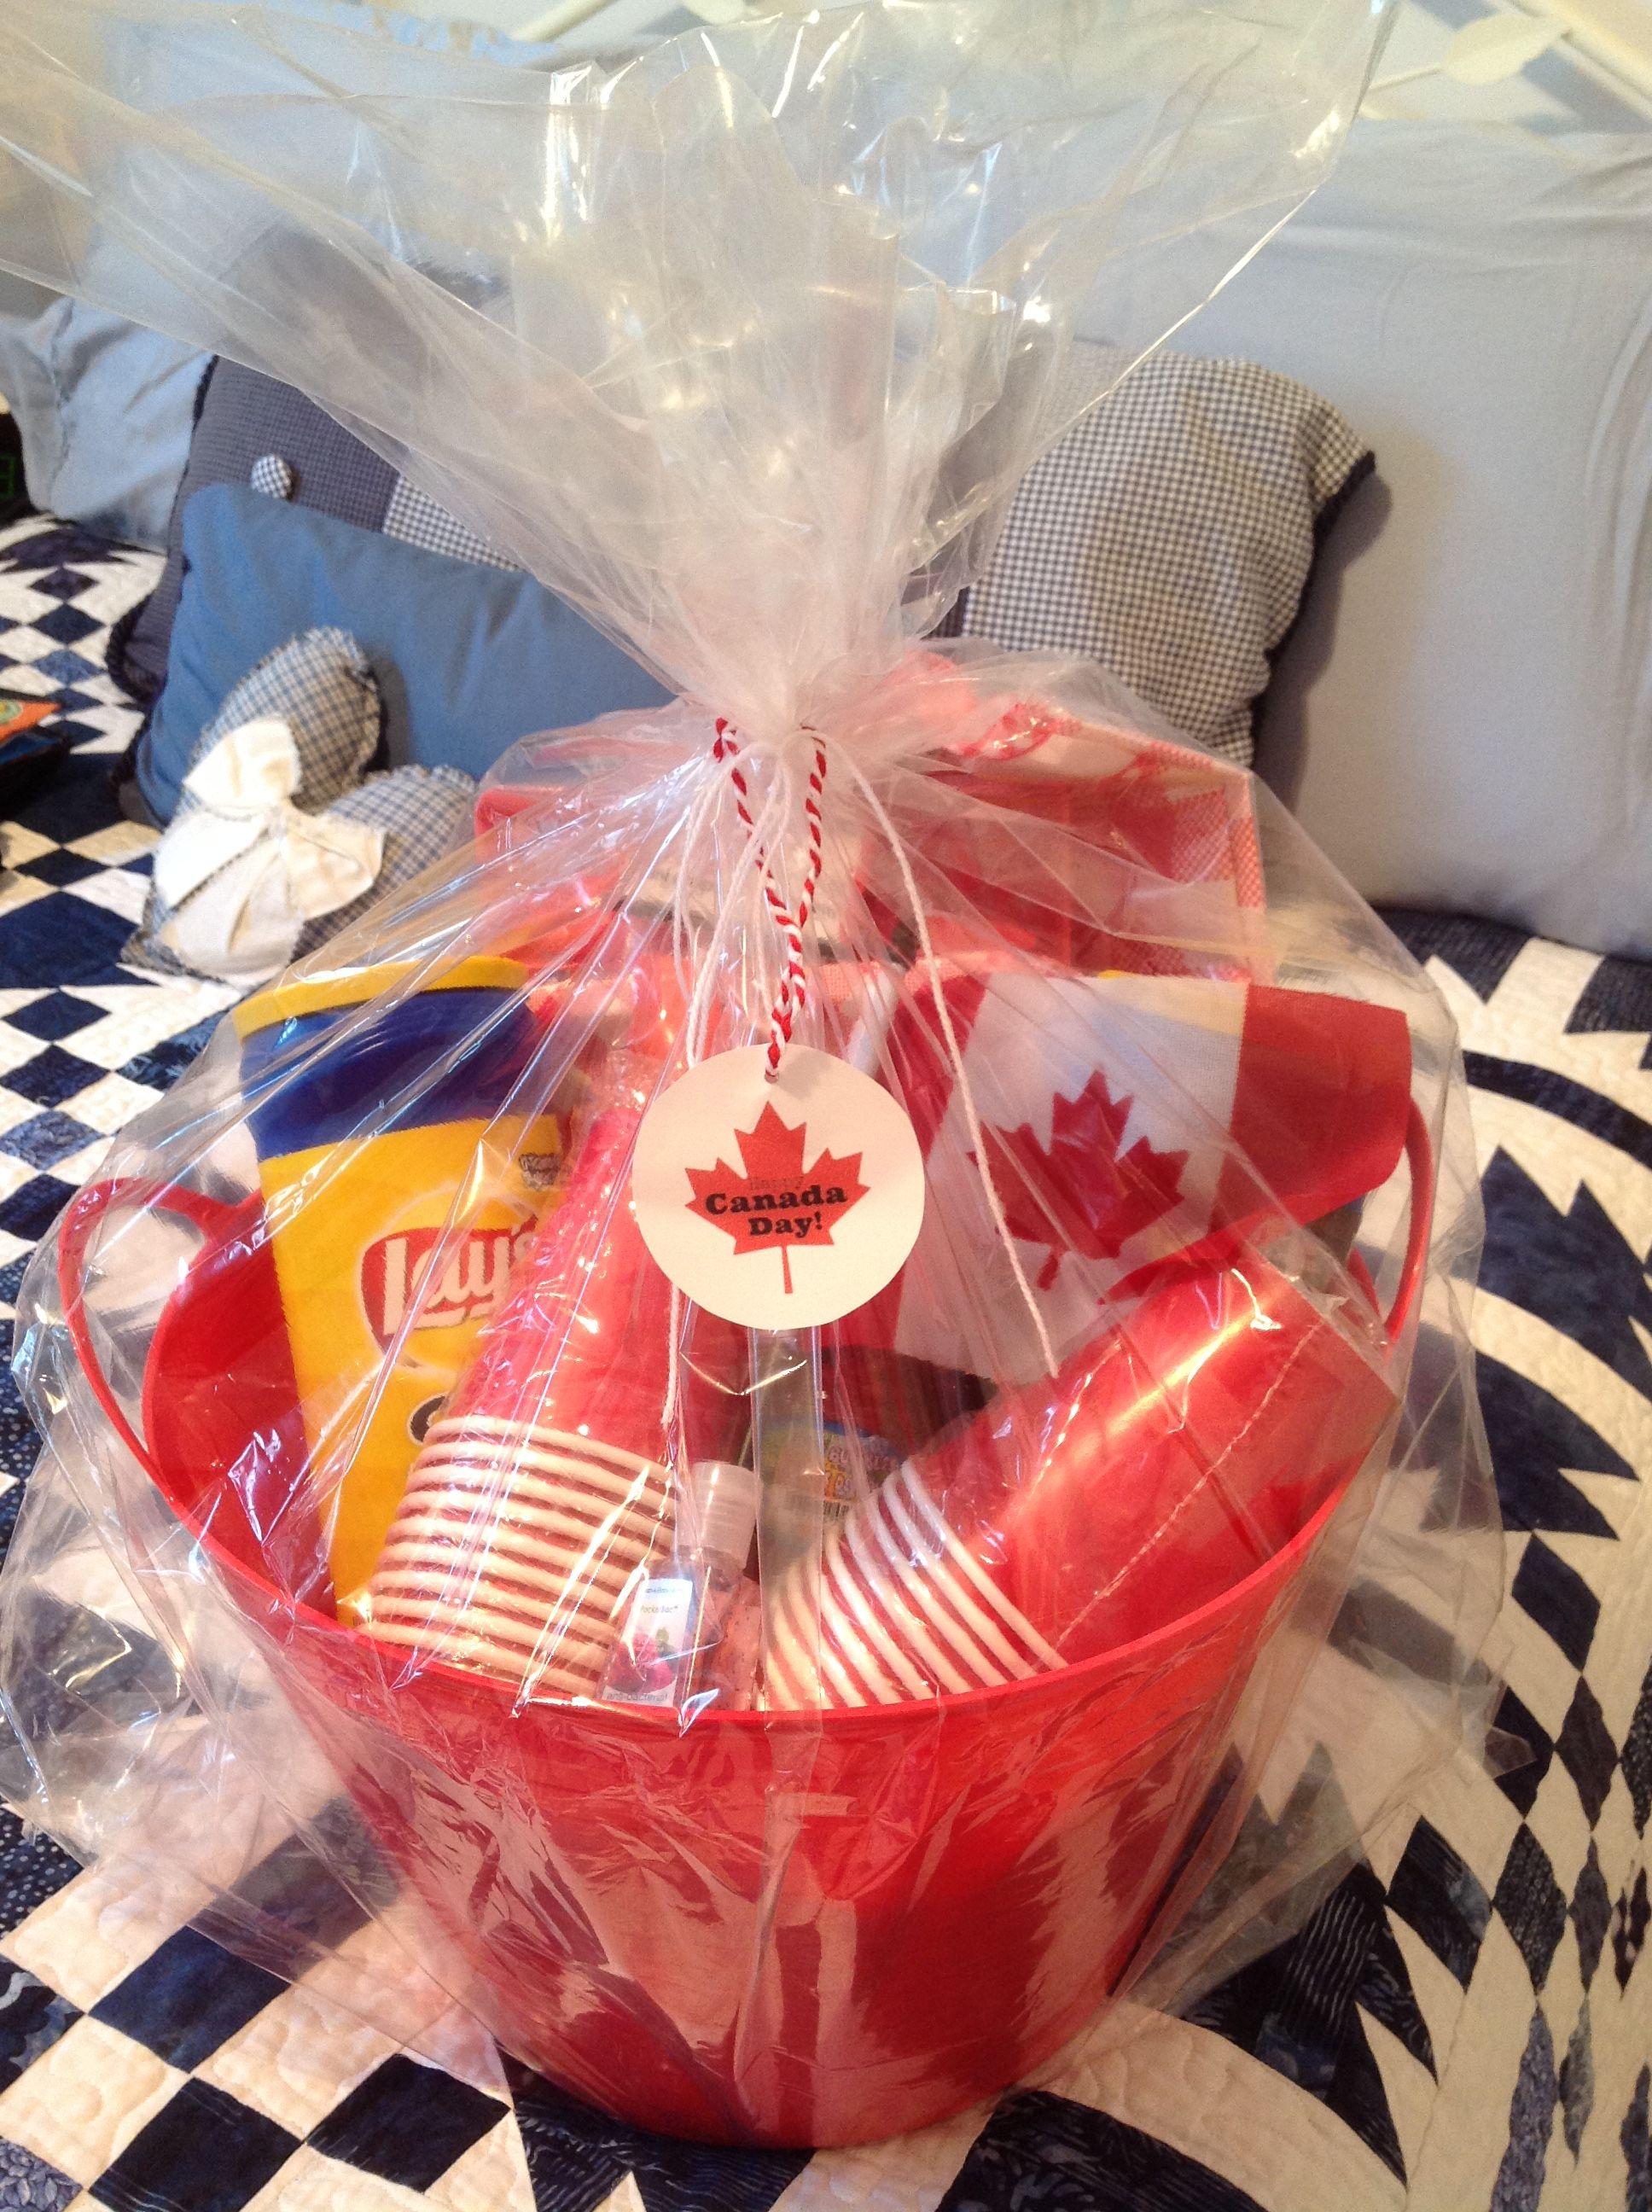 Canada day gift basket raffle basket canada gift gift